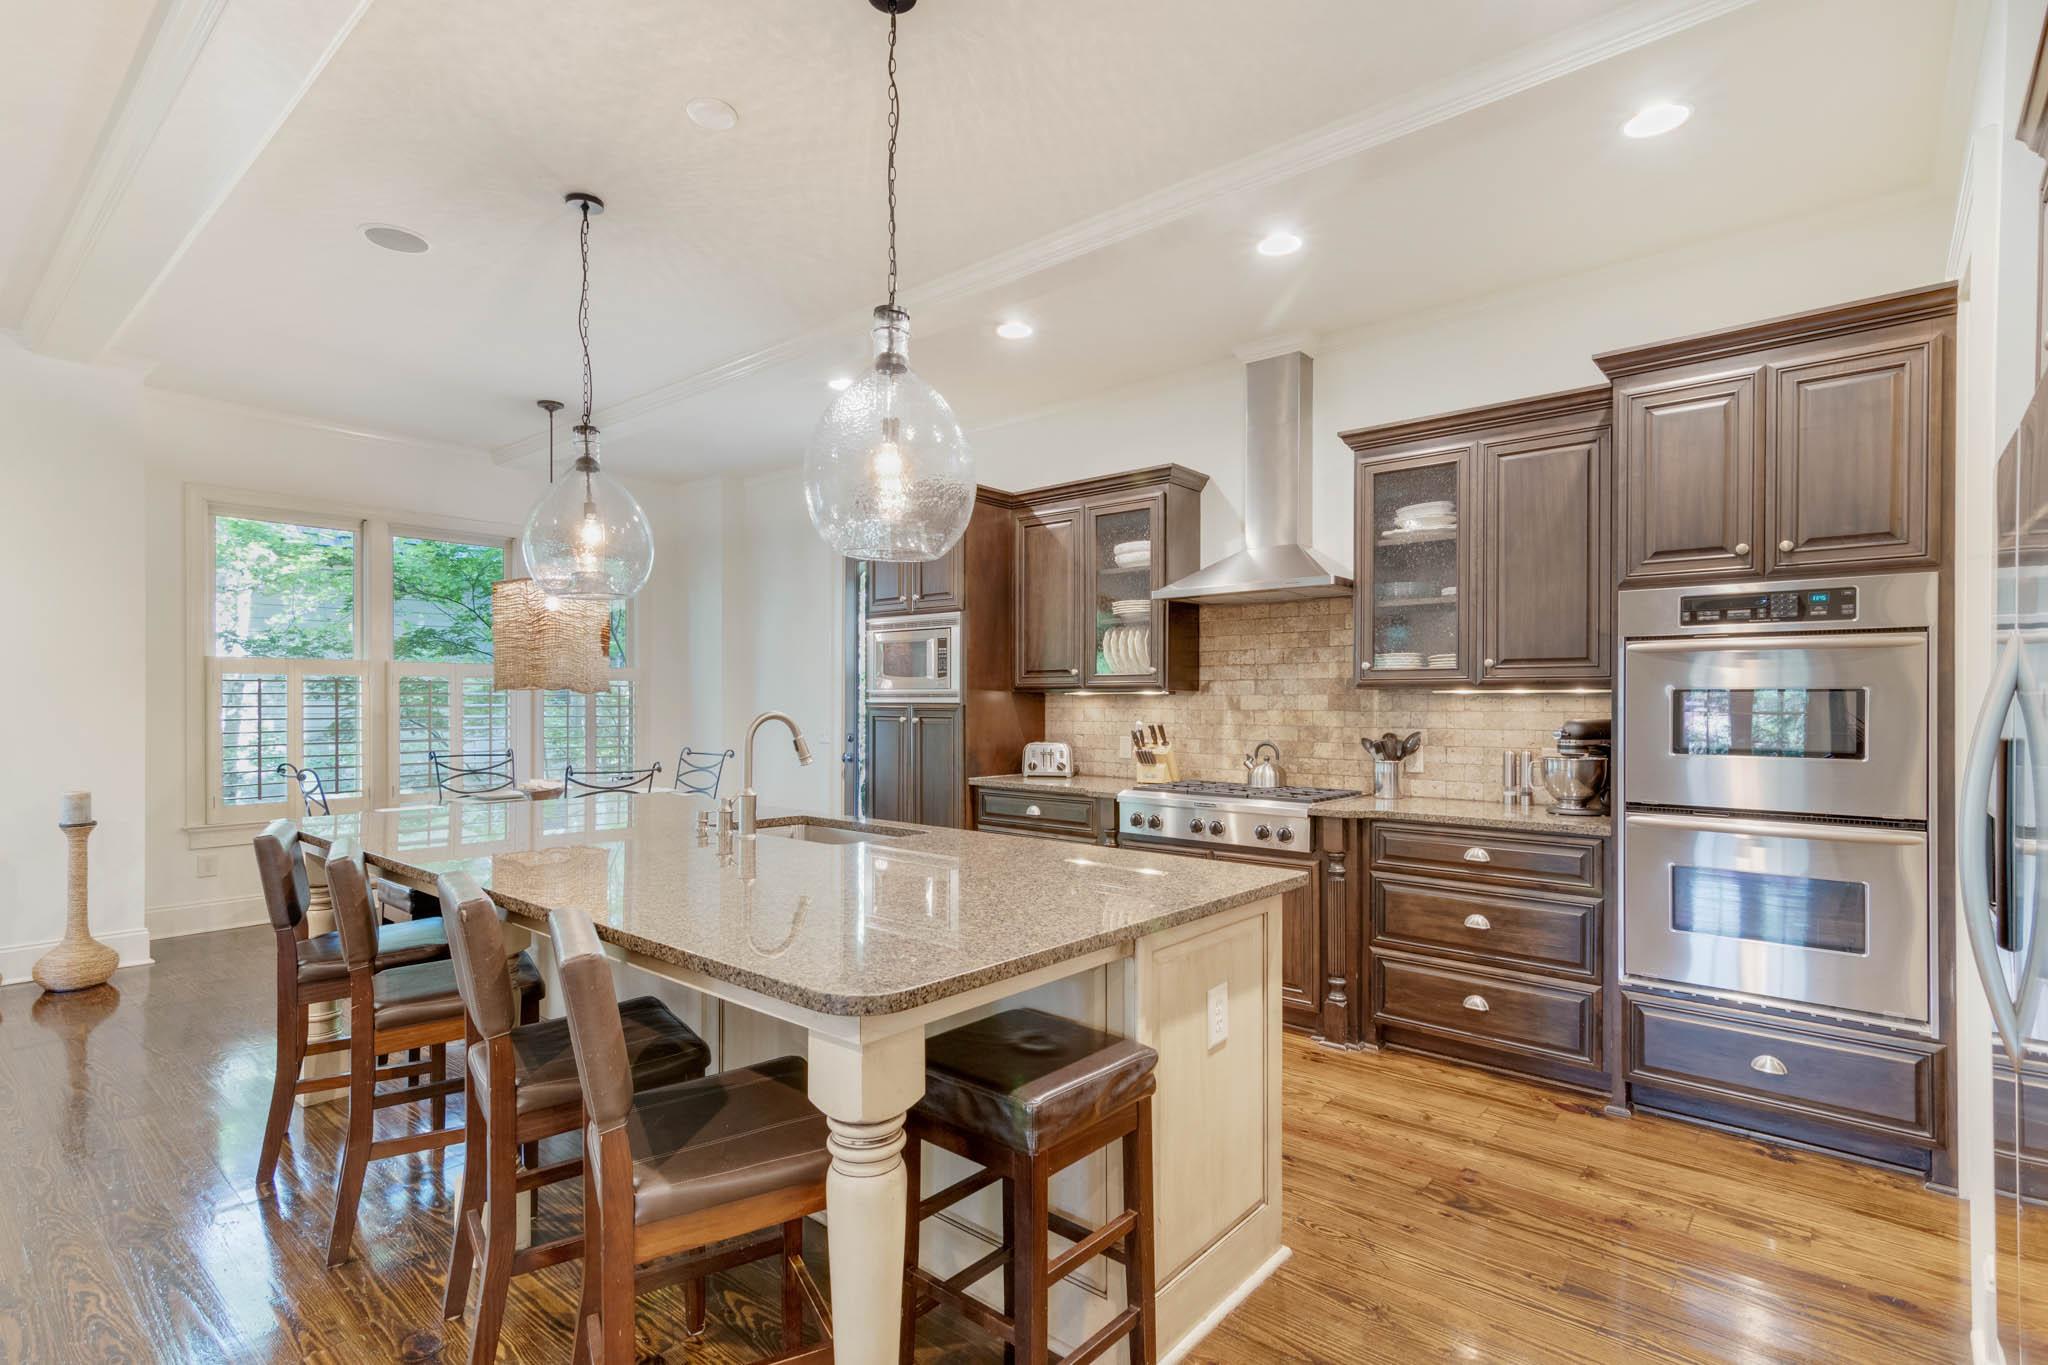 real_estate_photographer_kitchen_photography-7.jpg